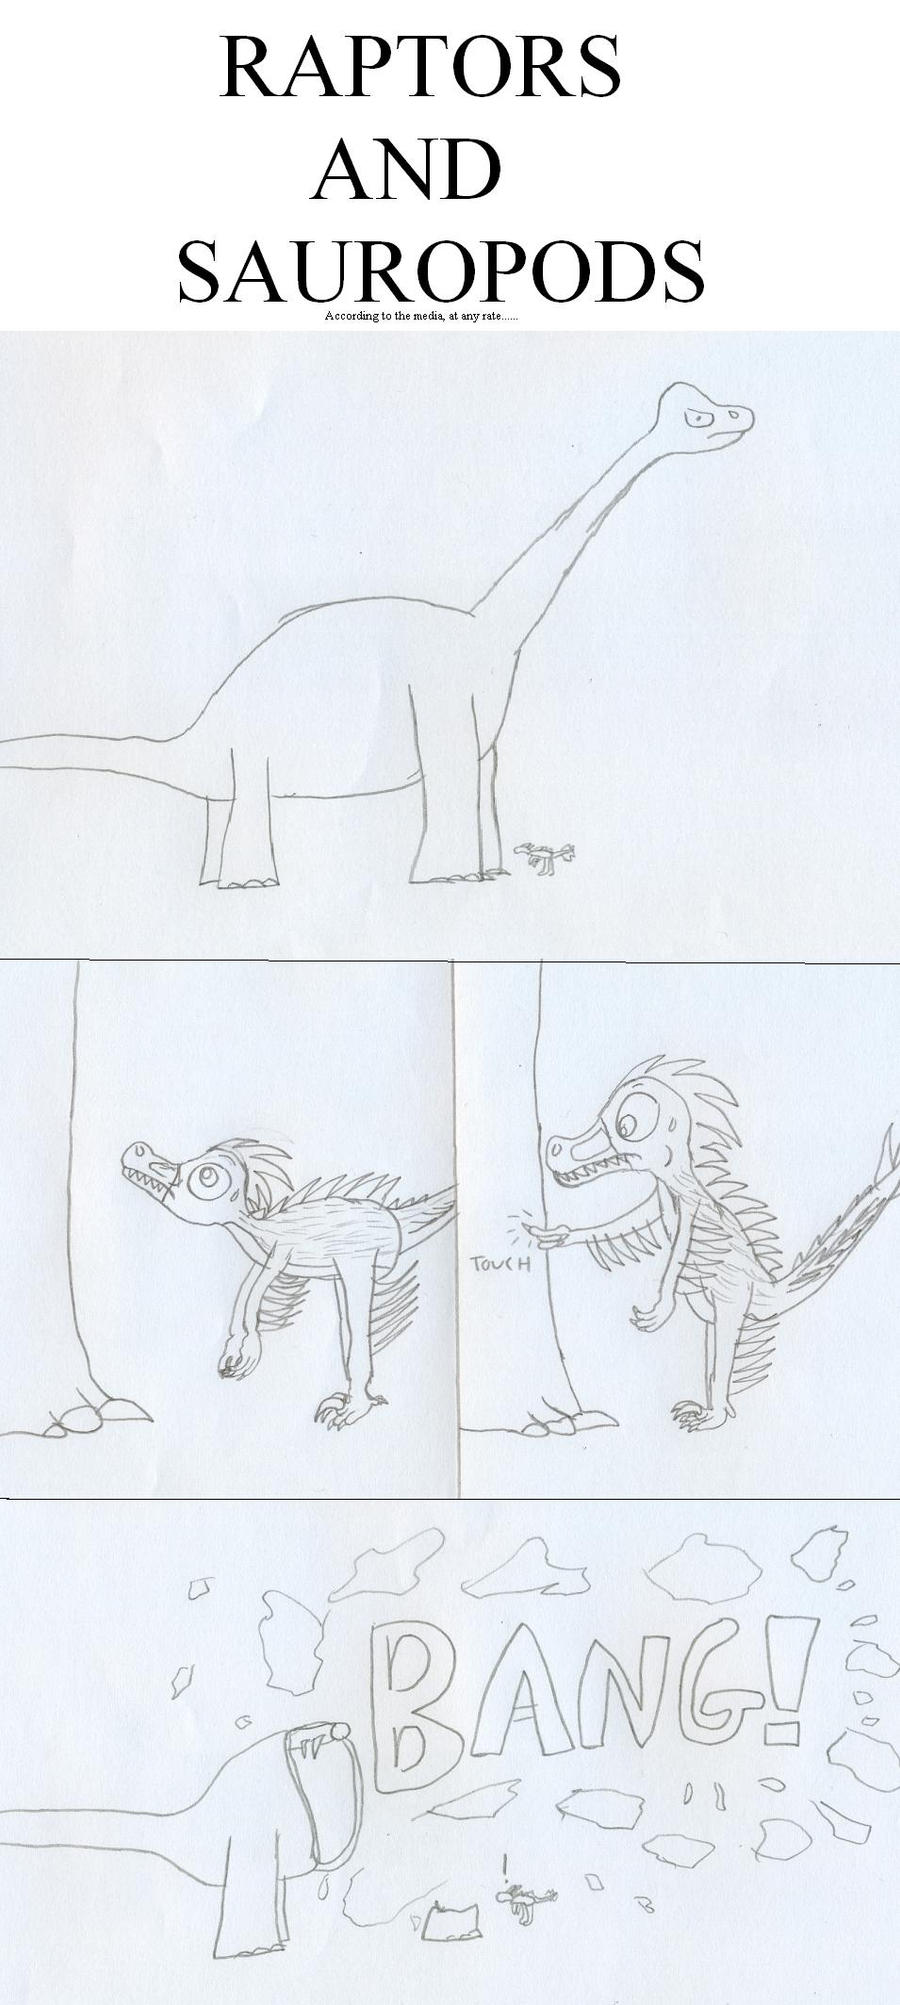 Raptors and Sauropods